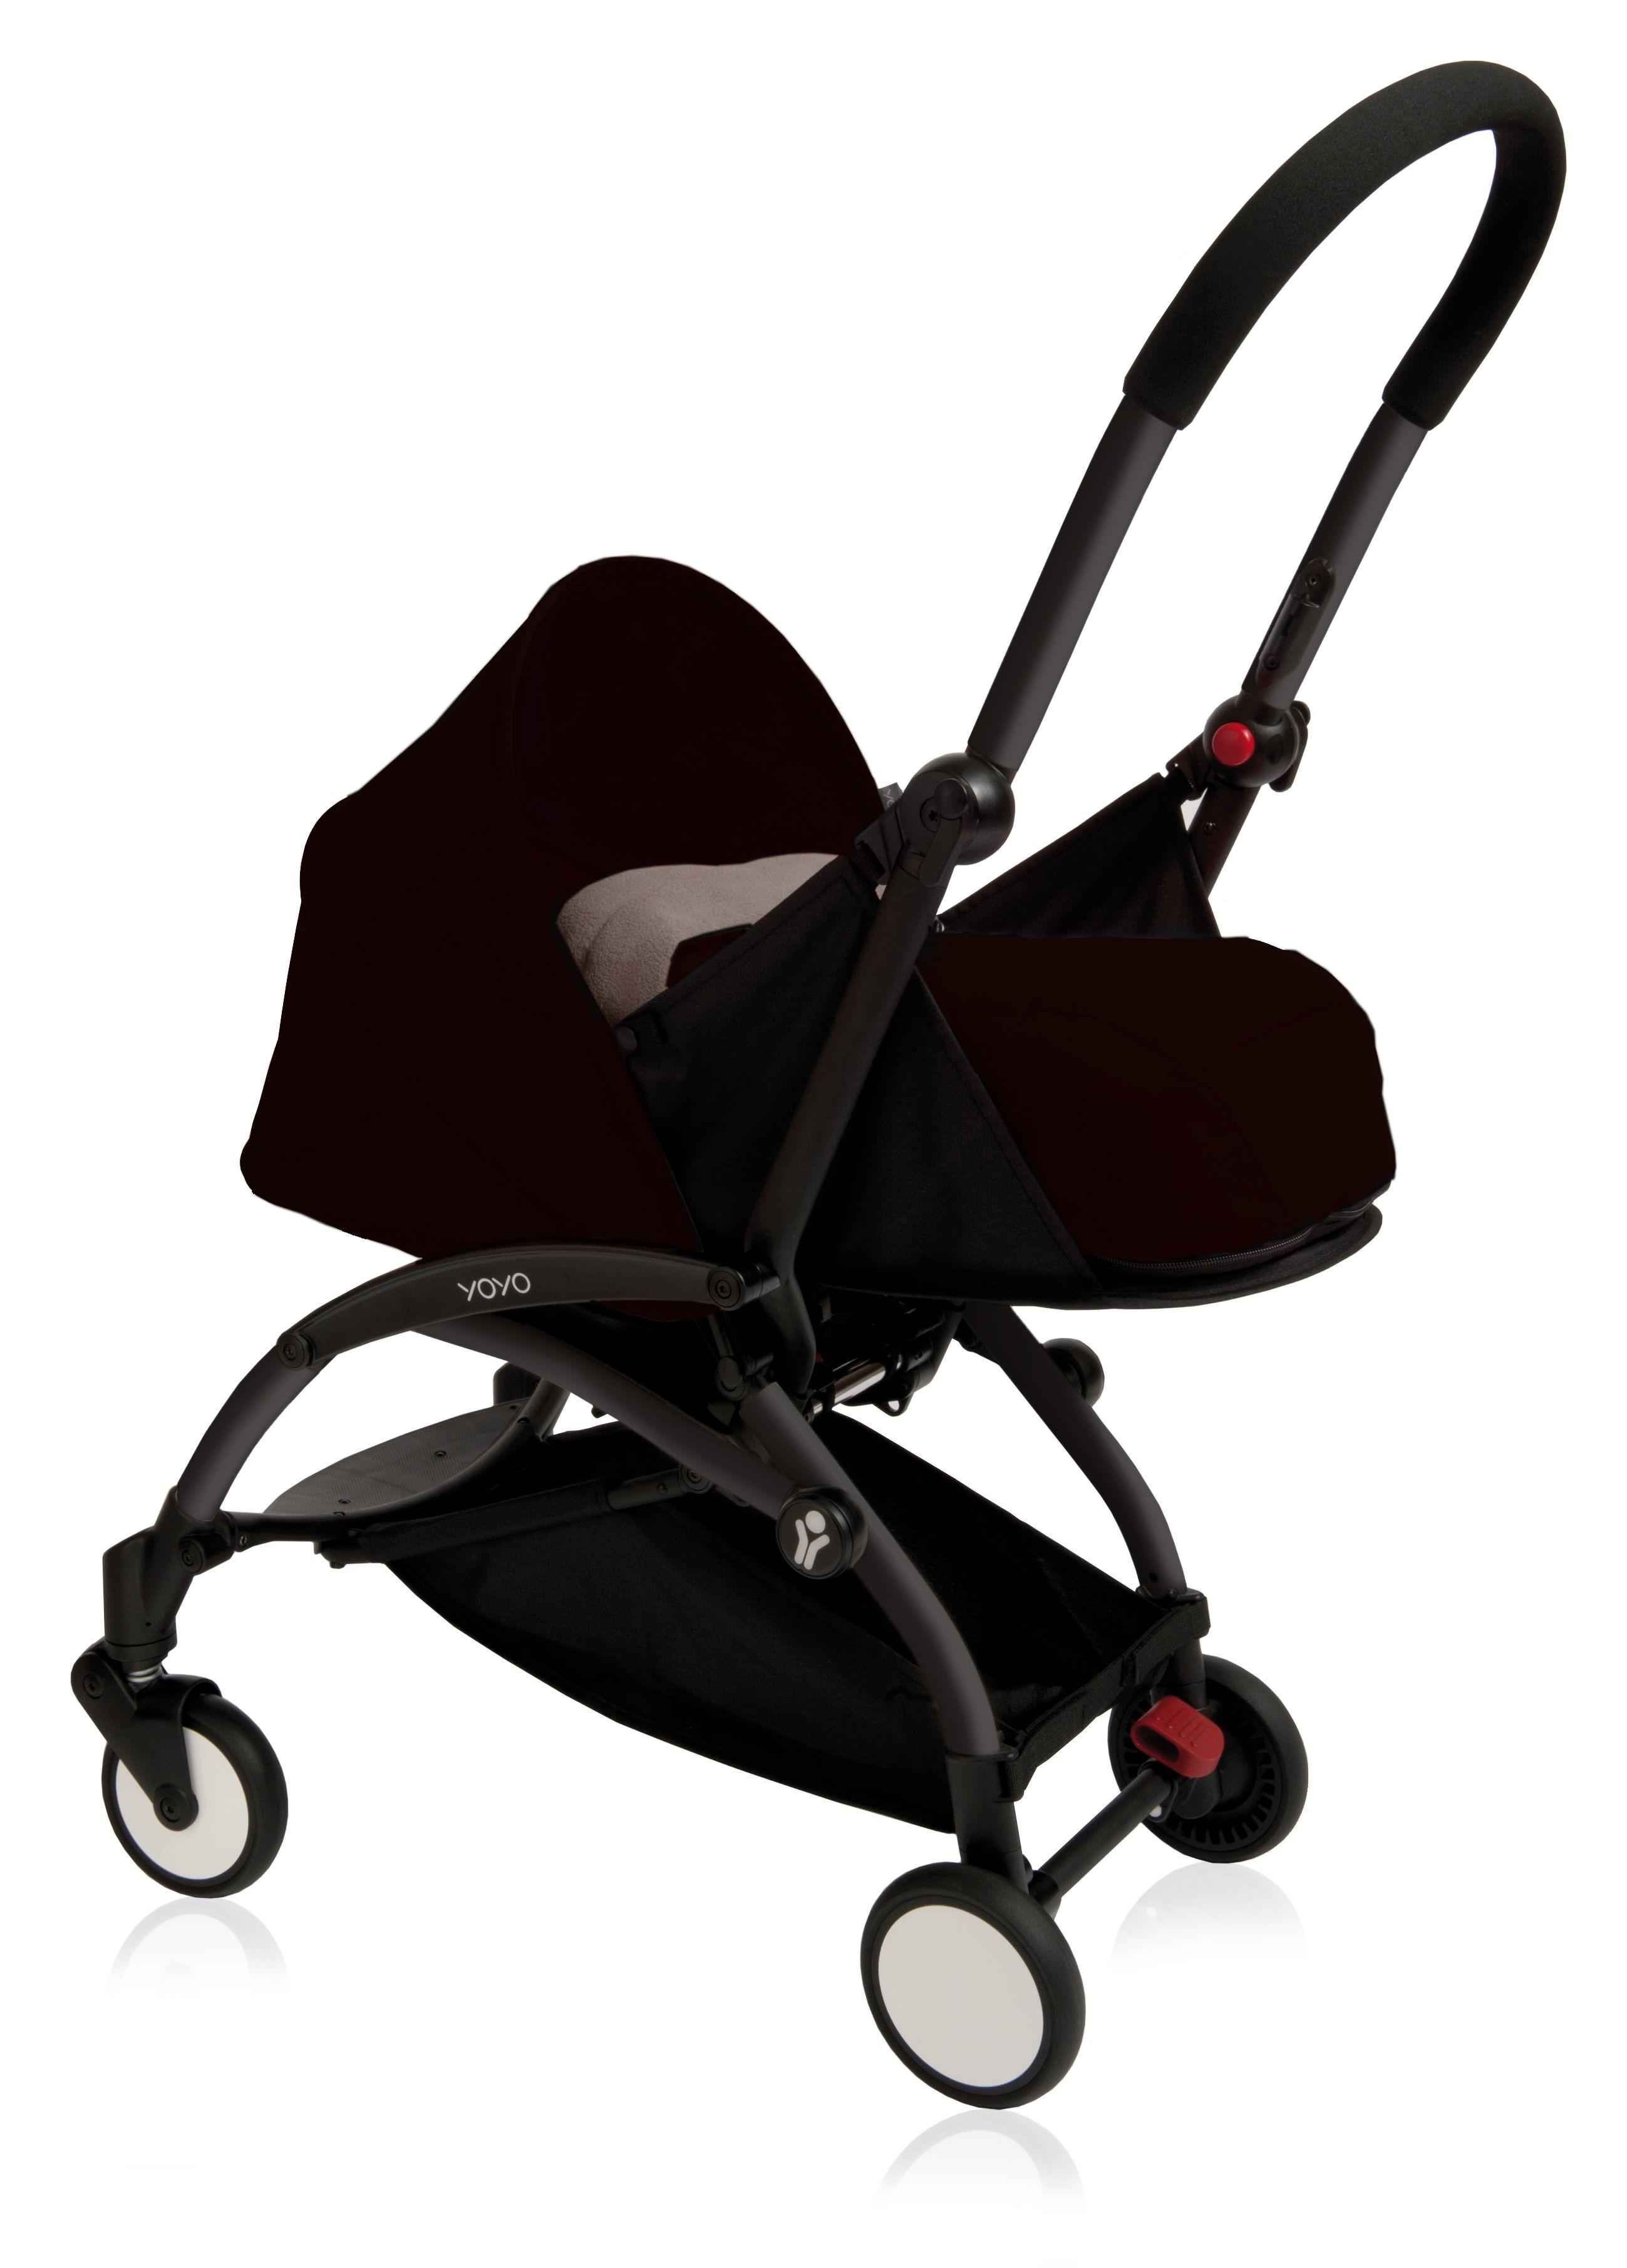 BABYZENYOYO 0+ black Newborn stroller, Babyzen yoyo